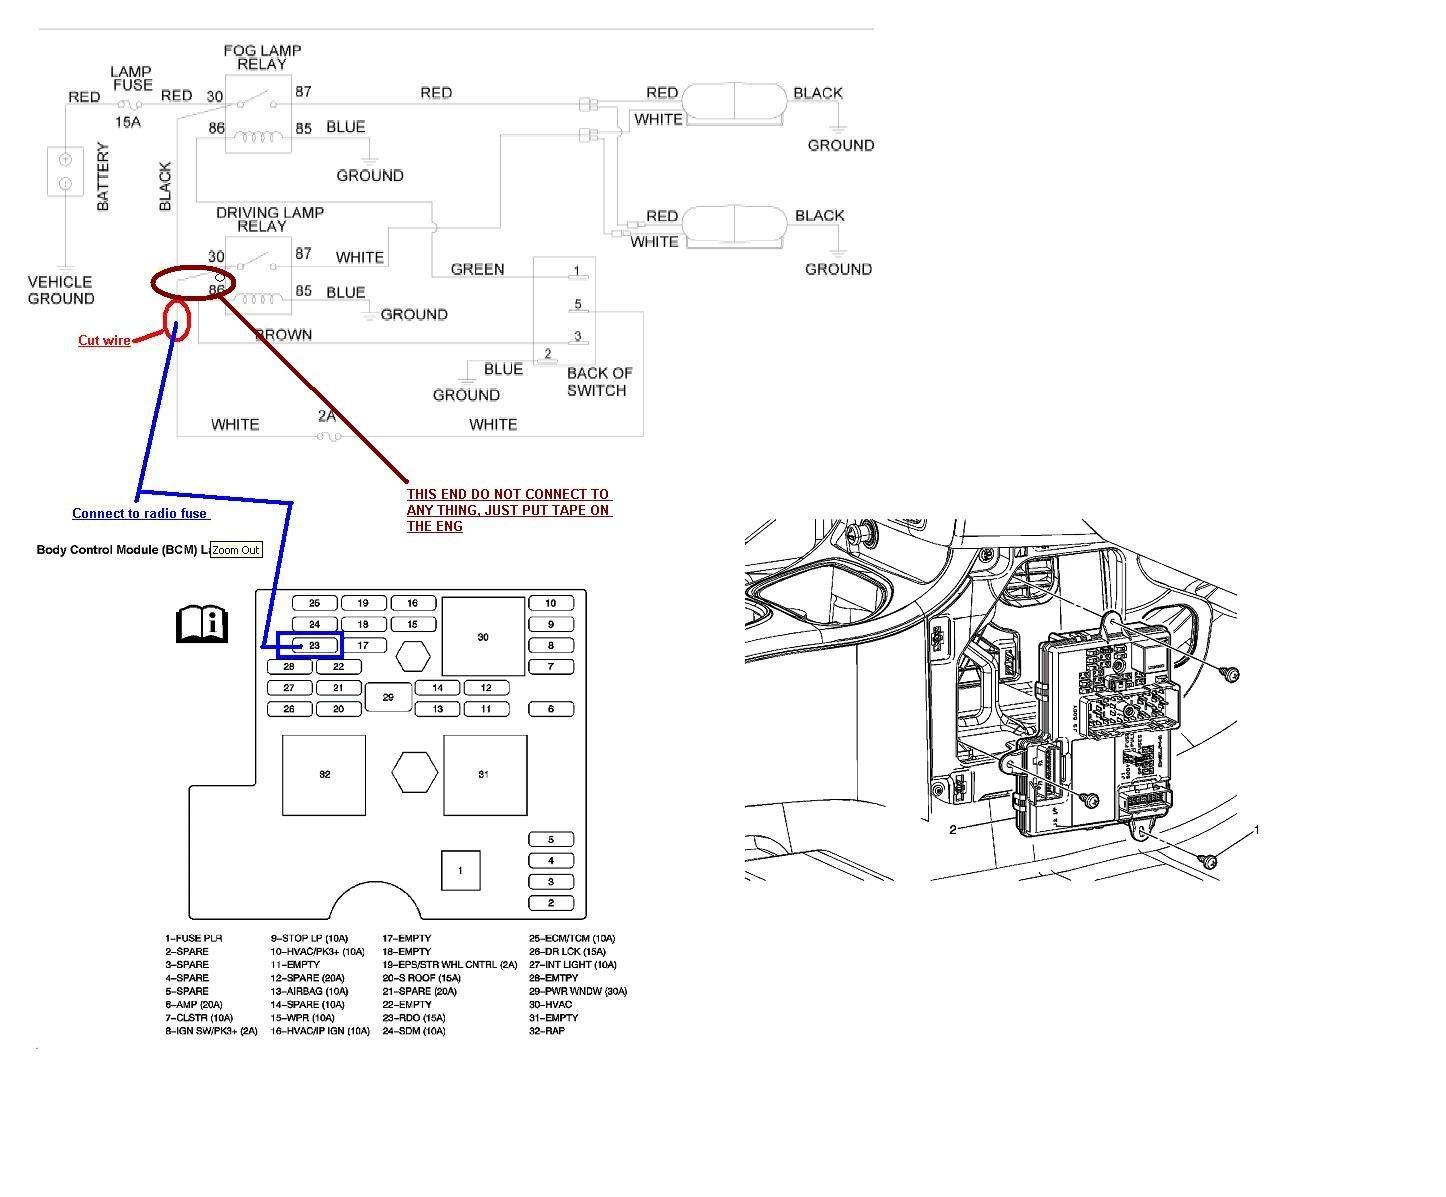 Fog Lamp Electrical Wiring Diagrams For Dummies Diagram Saga Flx